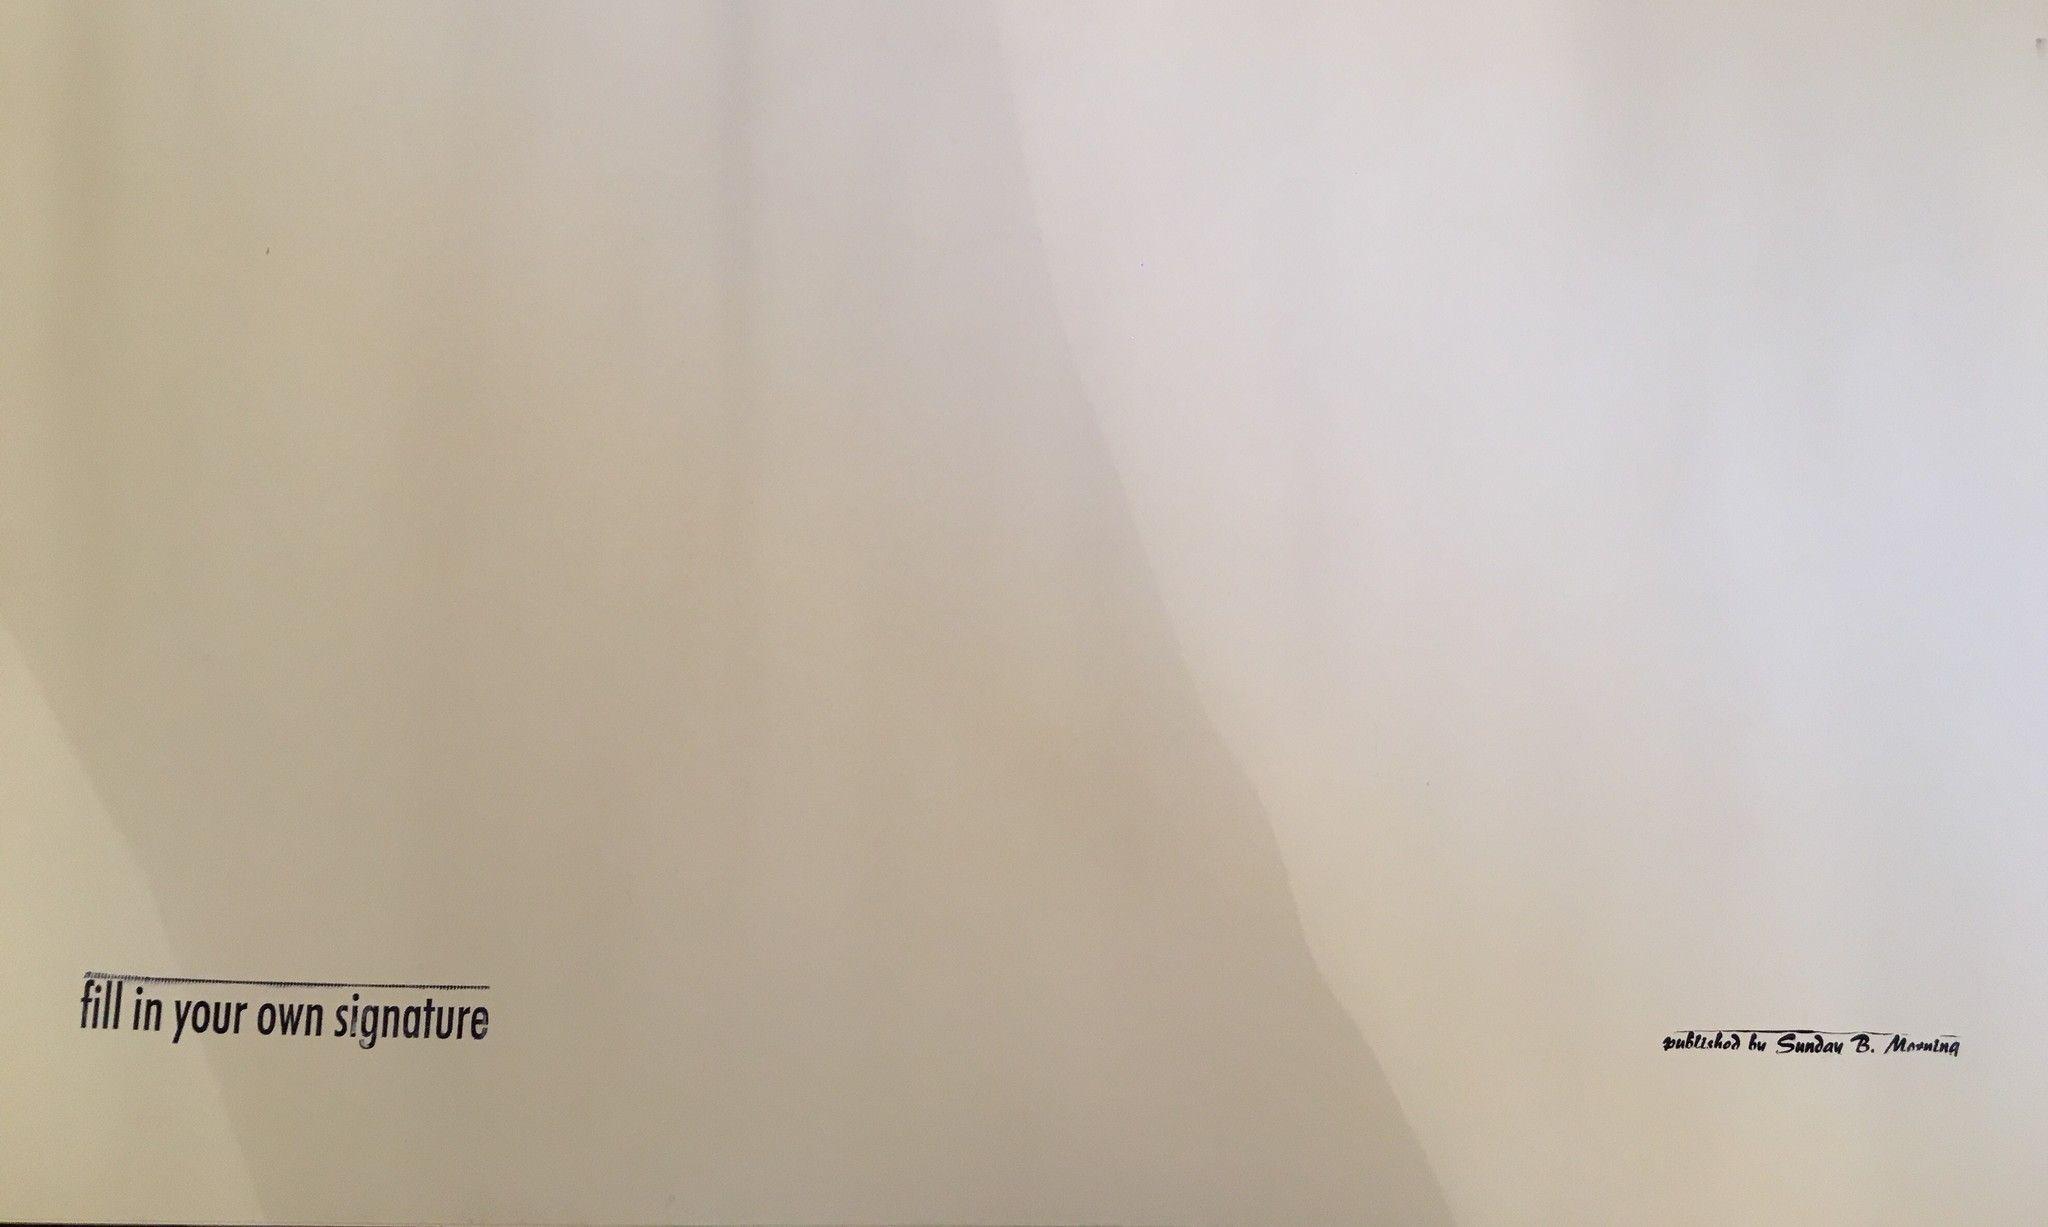 SERIGRAFIA ANDY WARHOL ' MARILYN 1 '  dimensioni L 91,5 x H 91,5 cm.